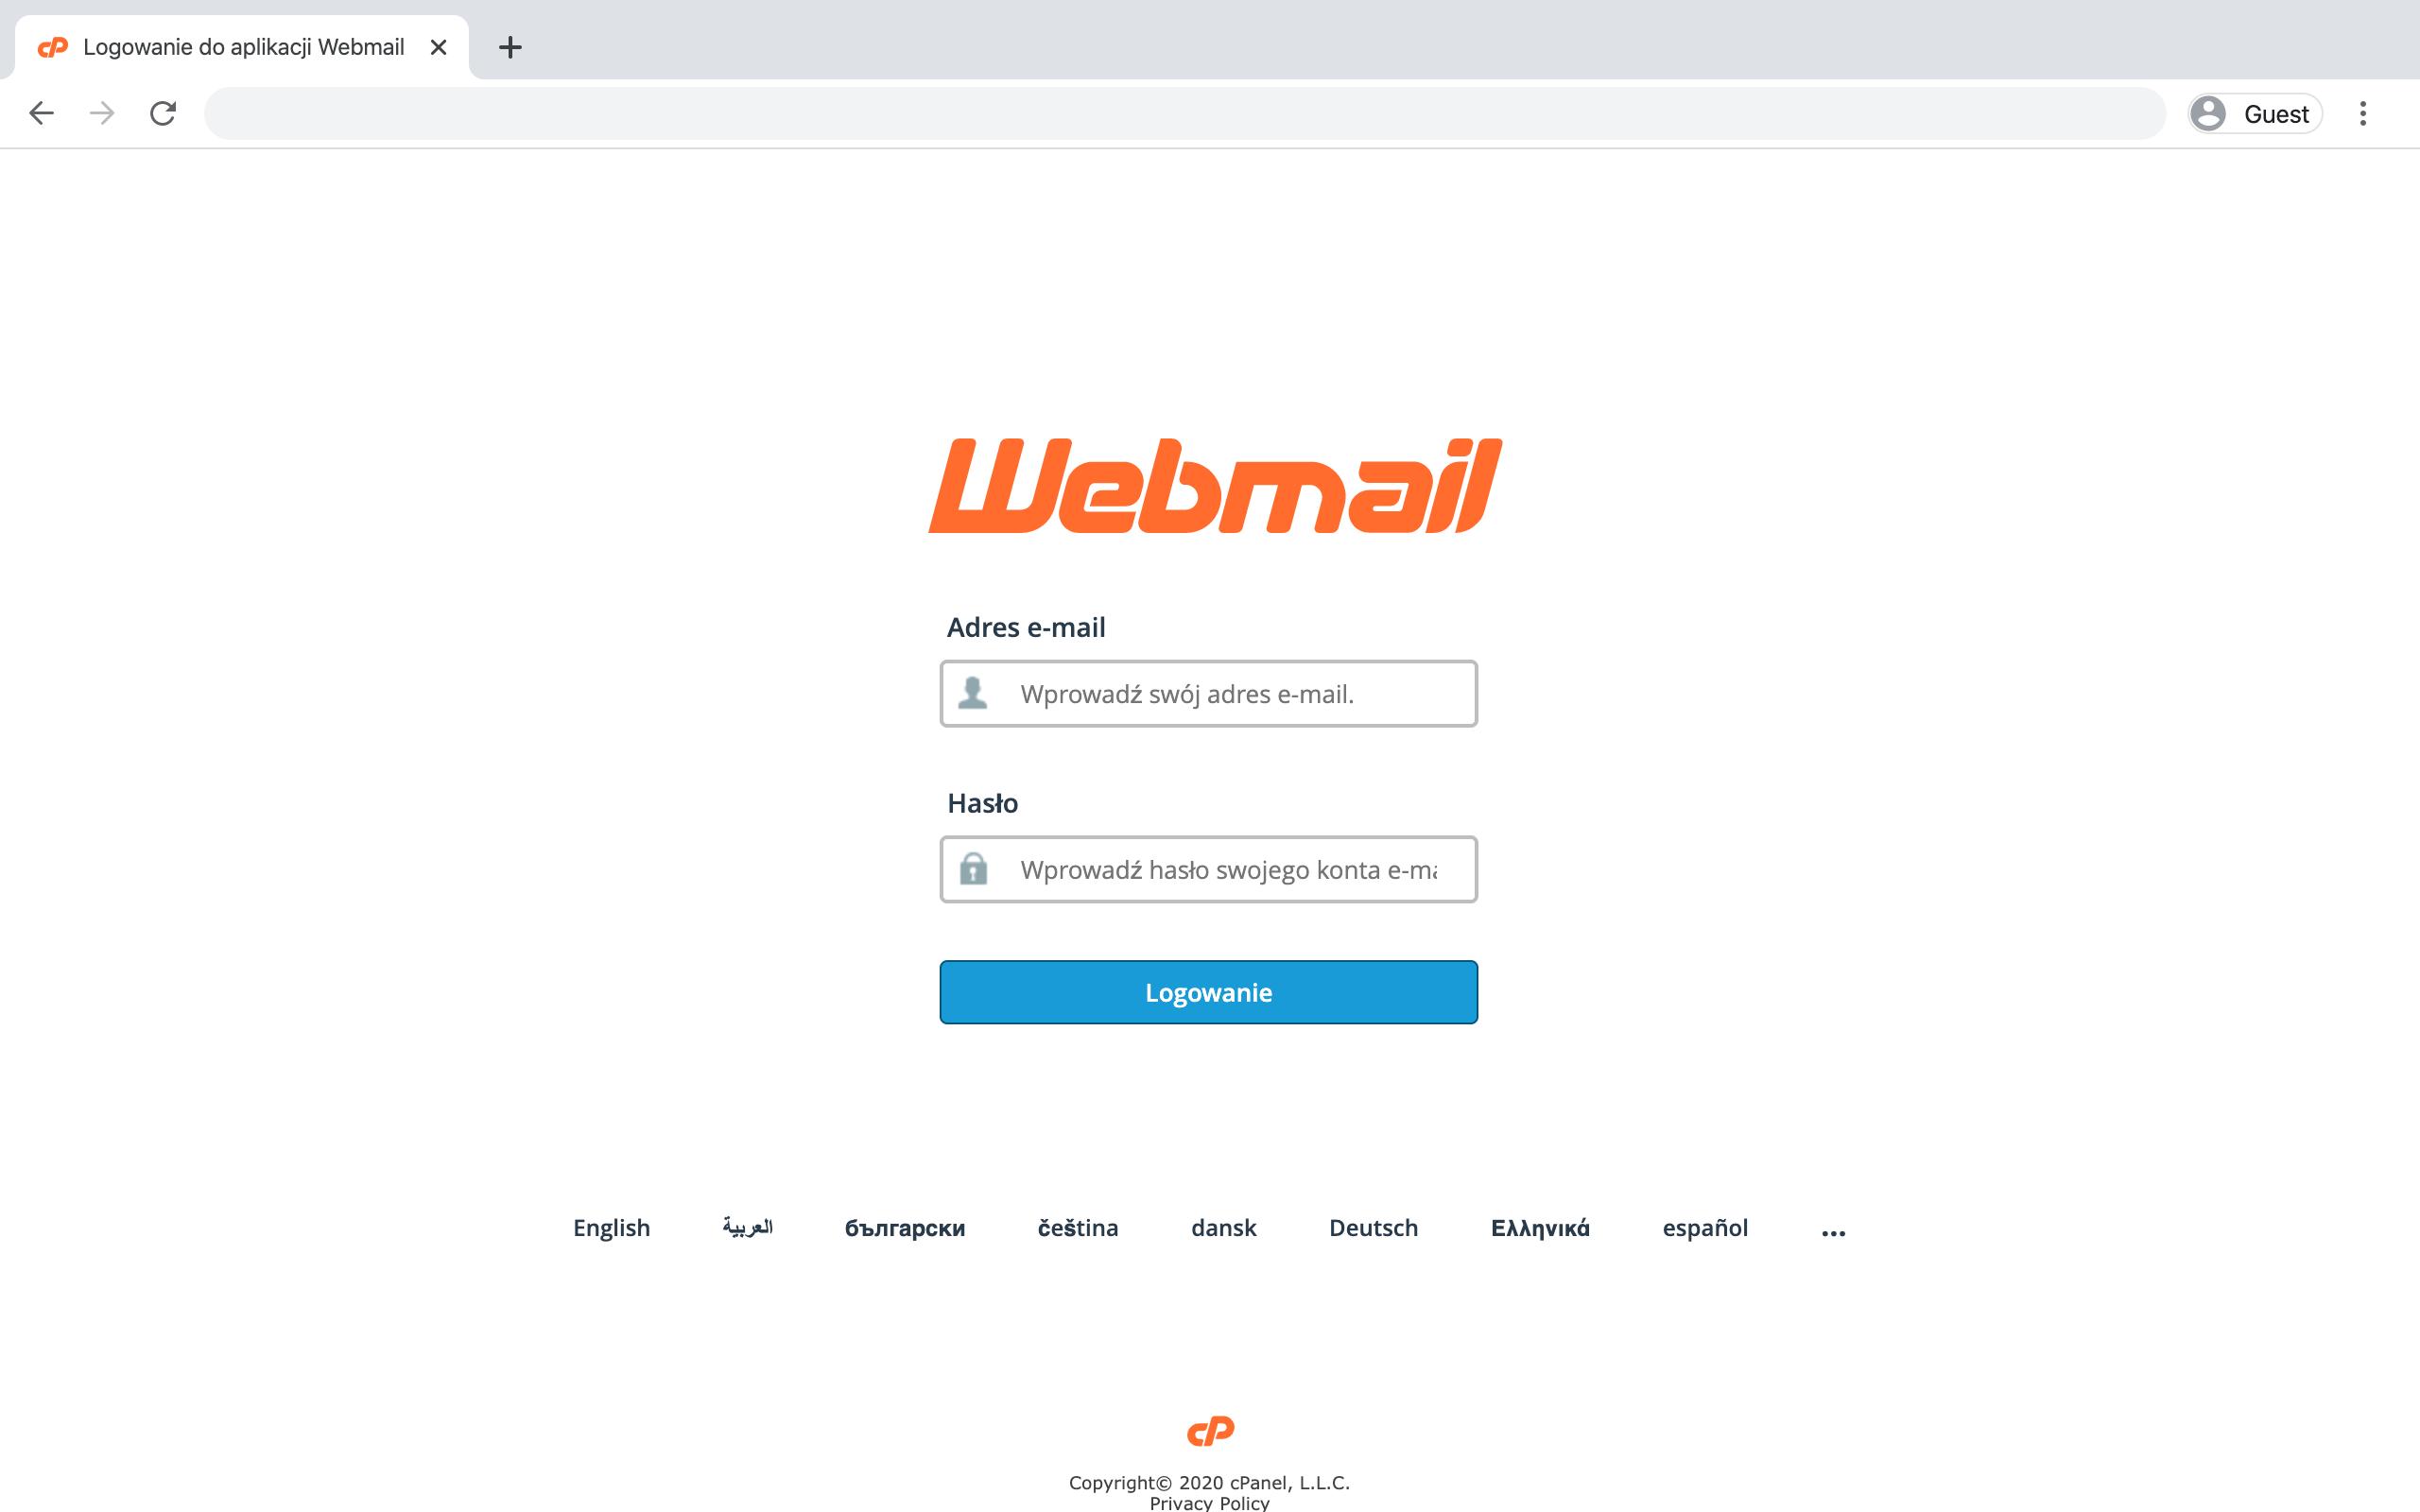 Logowanie do webmail